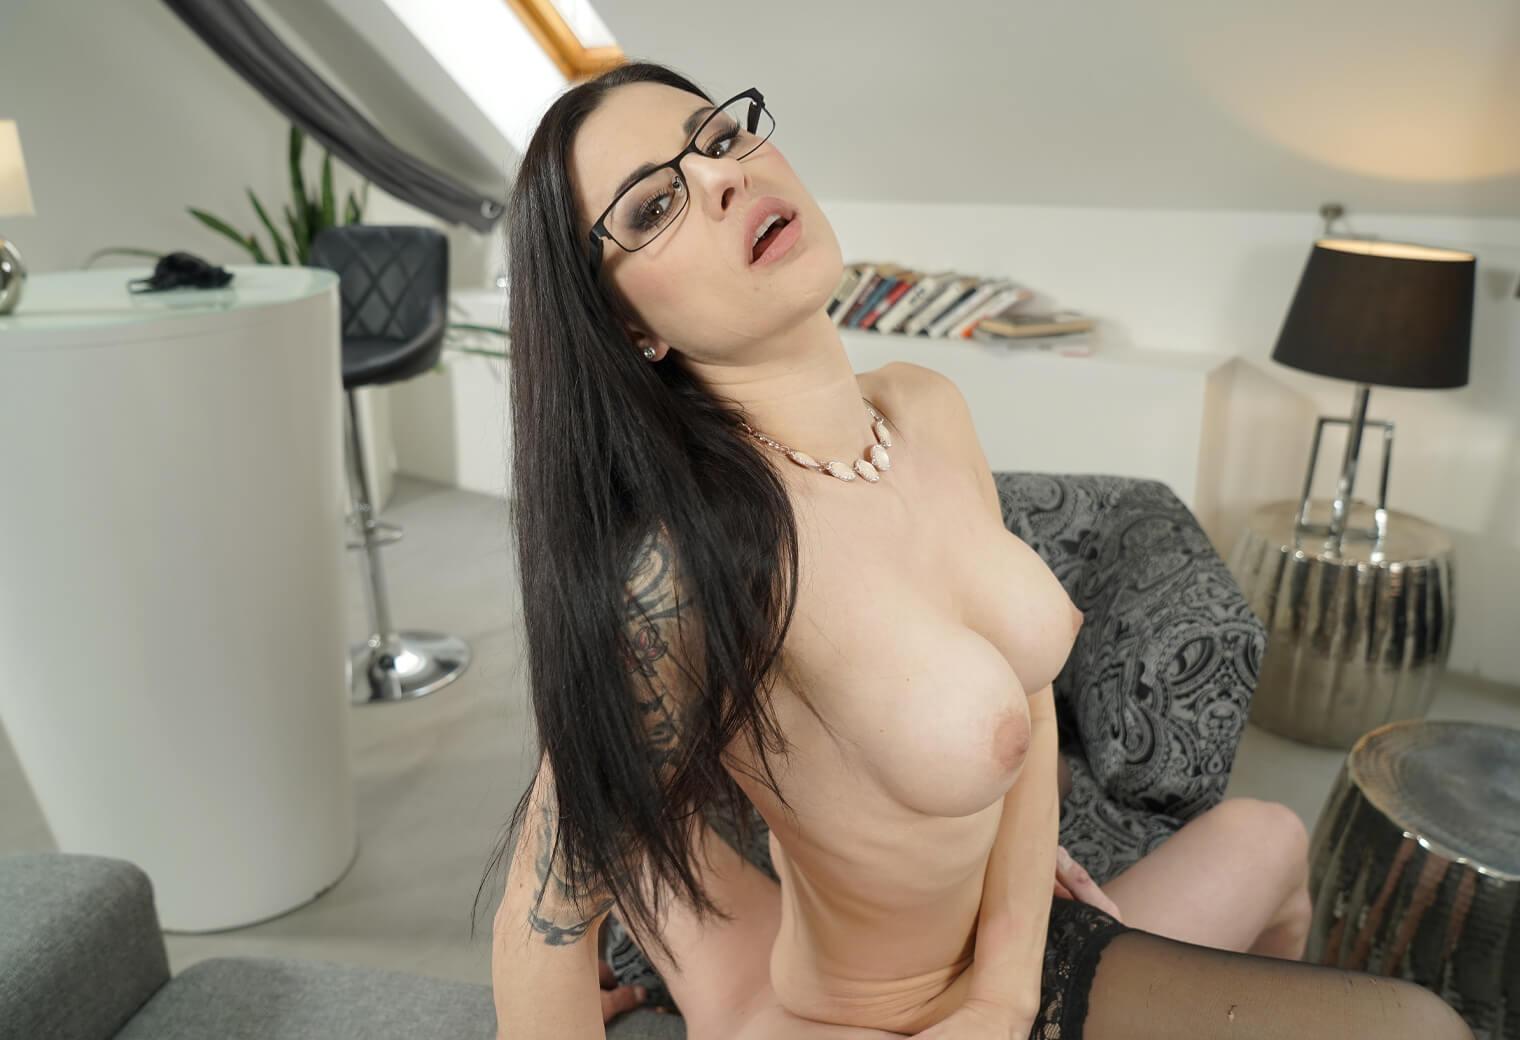 Billie Star Pornos & Sexfilme Kostenlos - FRAUPORNO